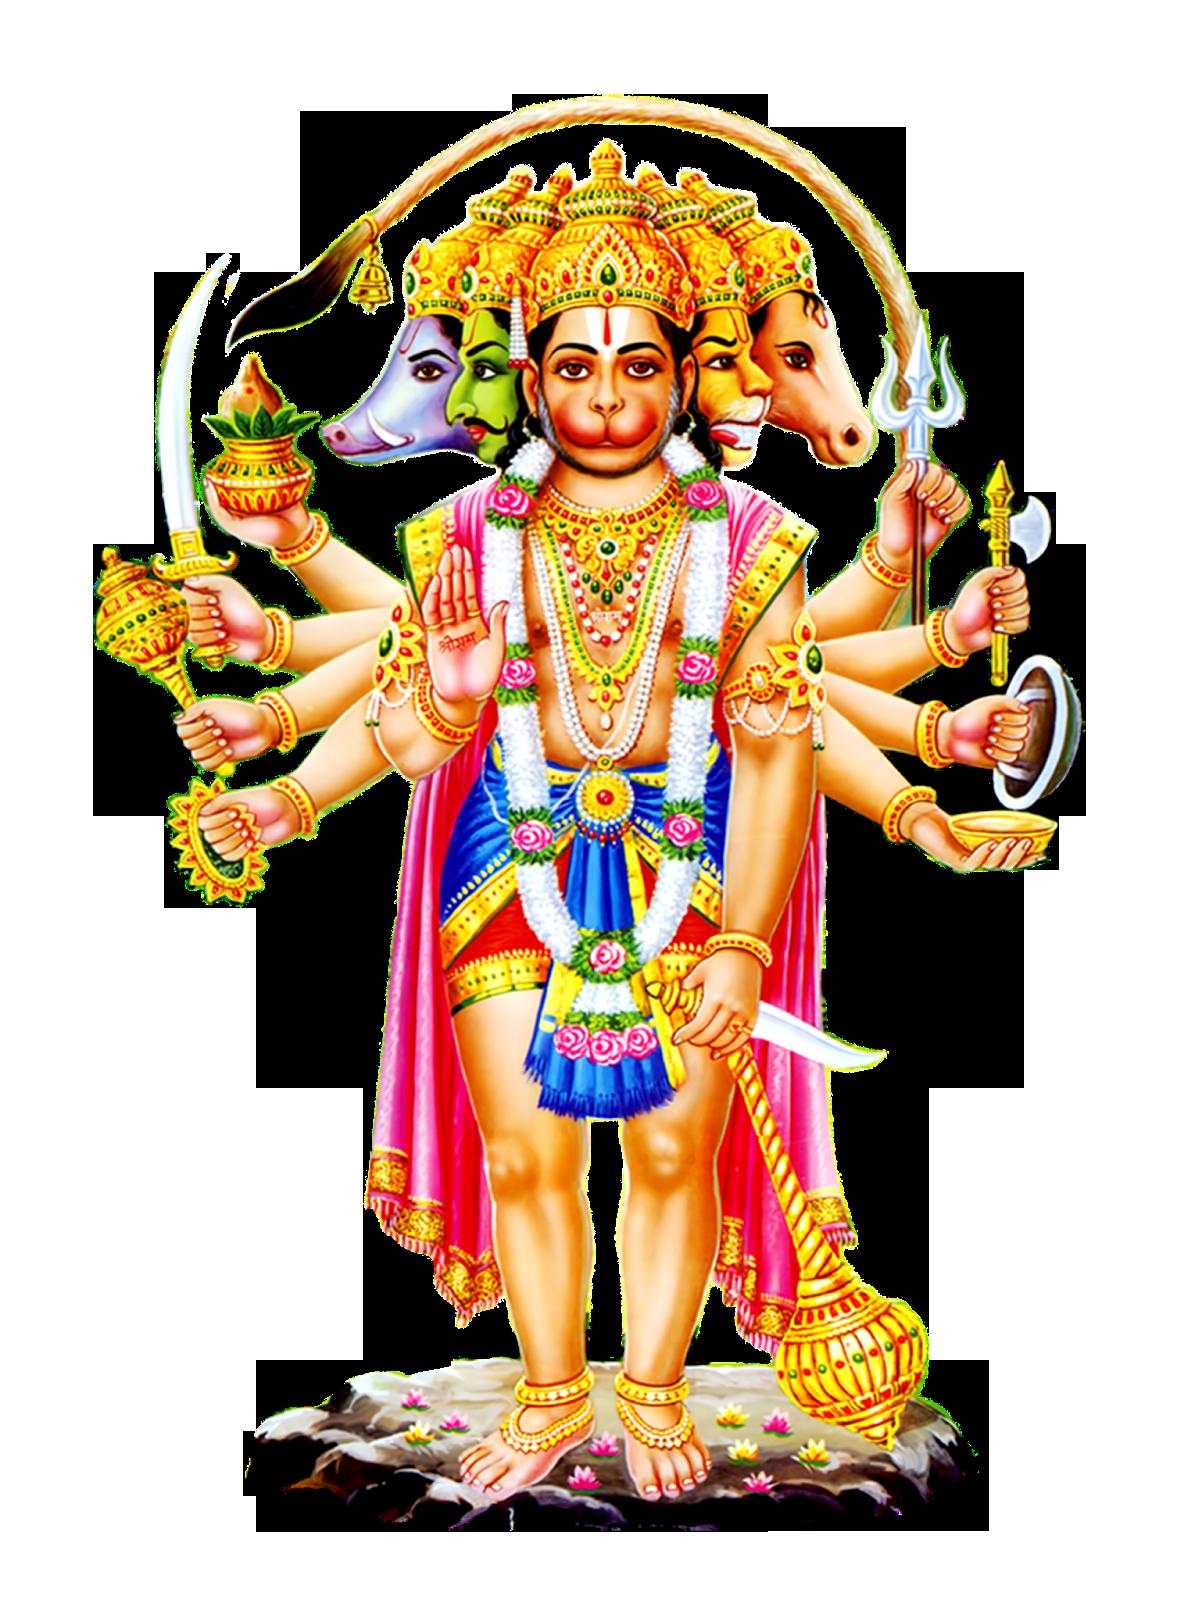 Panchamukhi hanuman hd png photo free - Panchmukhi hanuman image ...